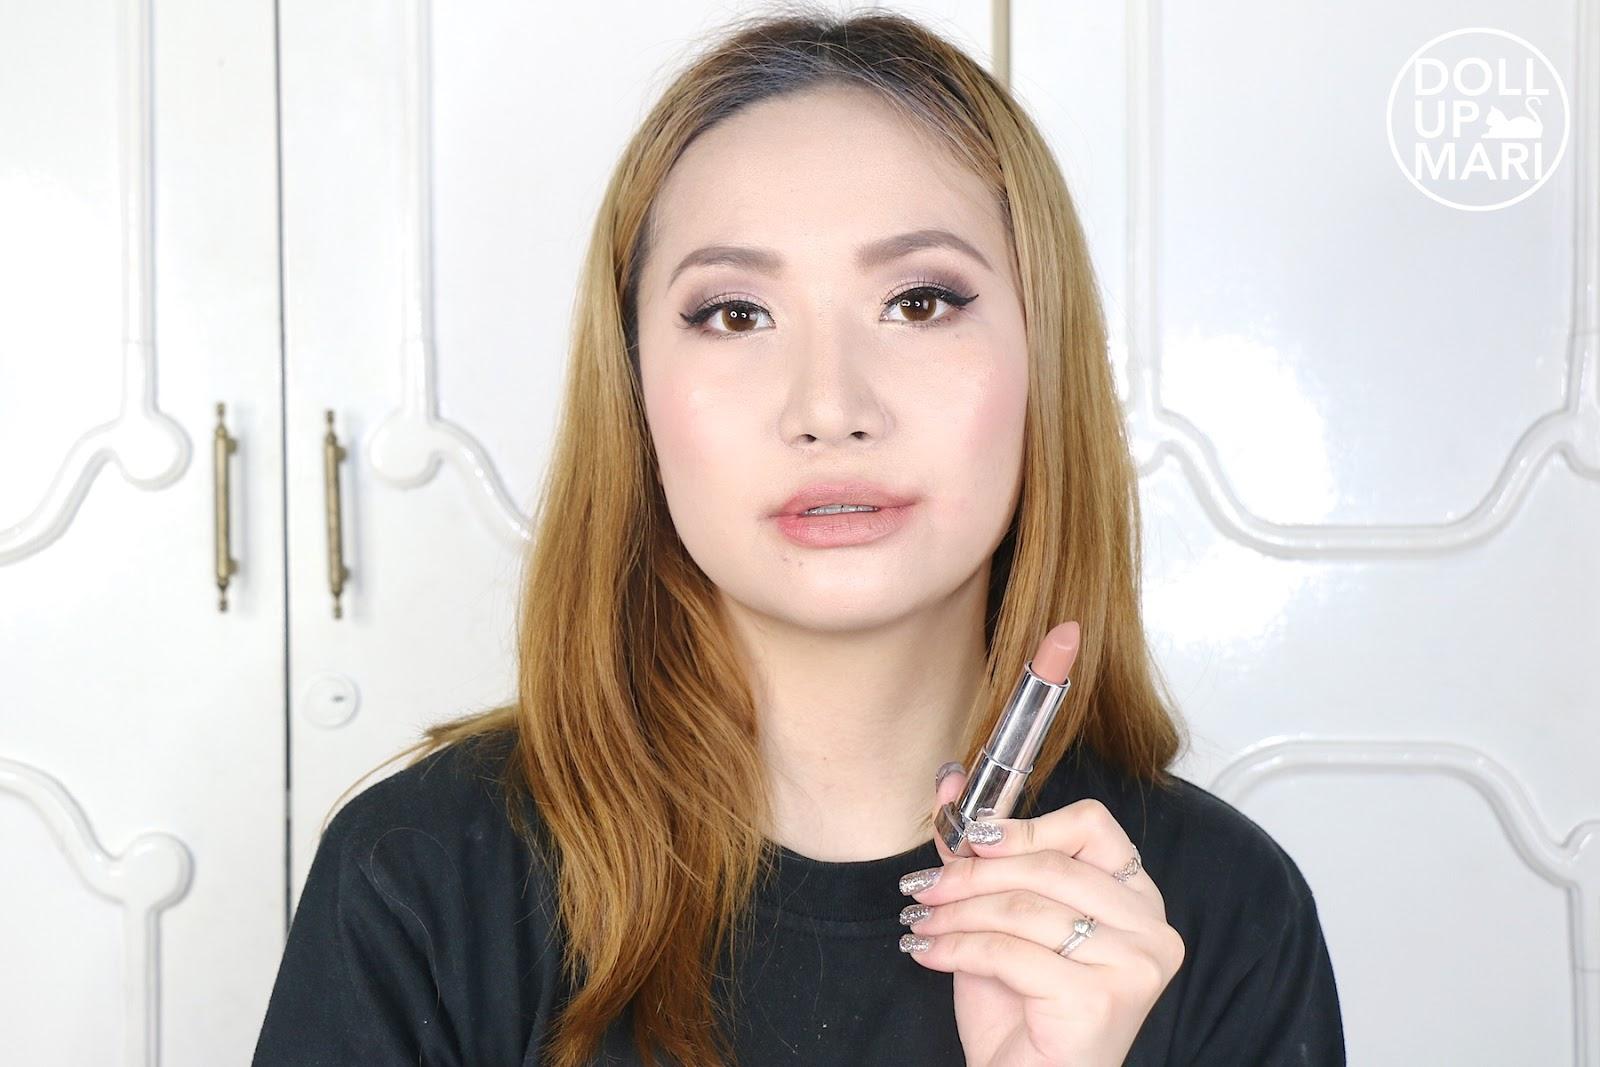 Maybelline Color Sensational Creamy Matte Lipstick in 650